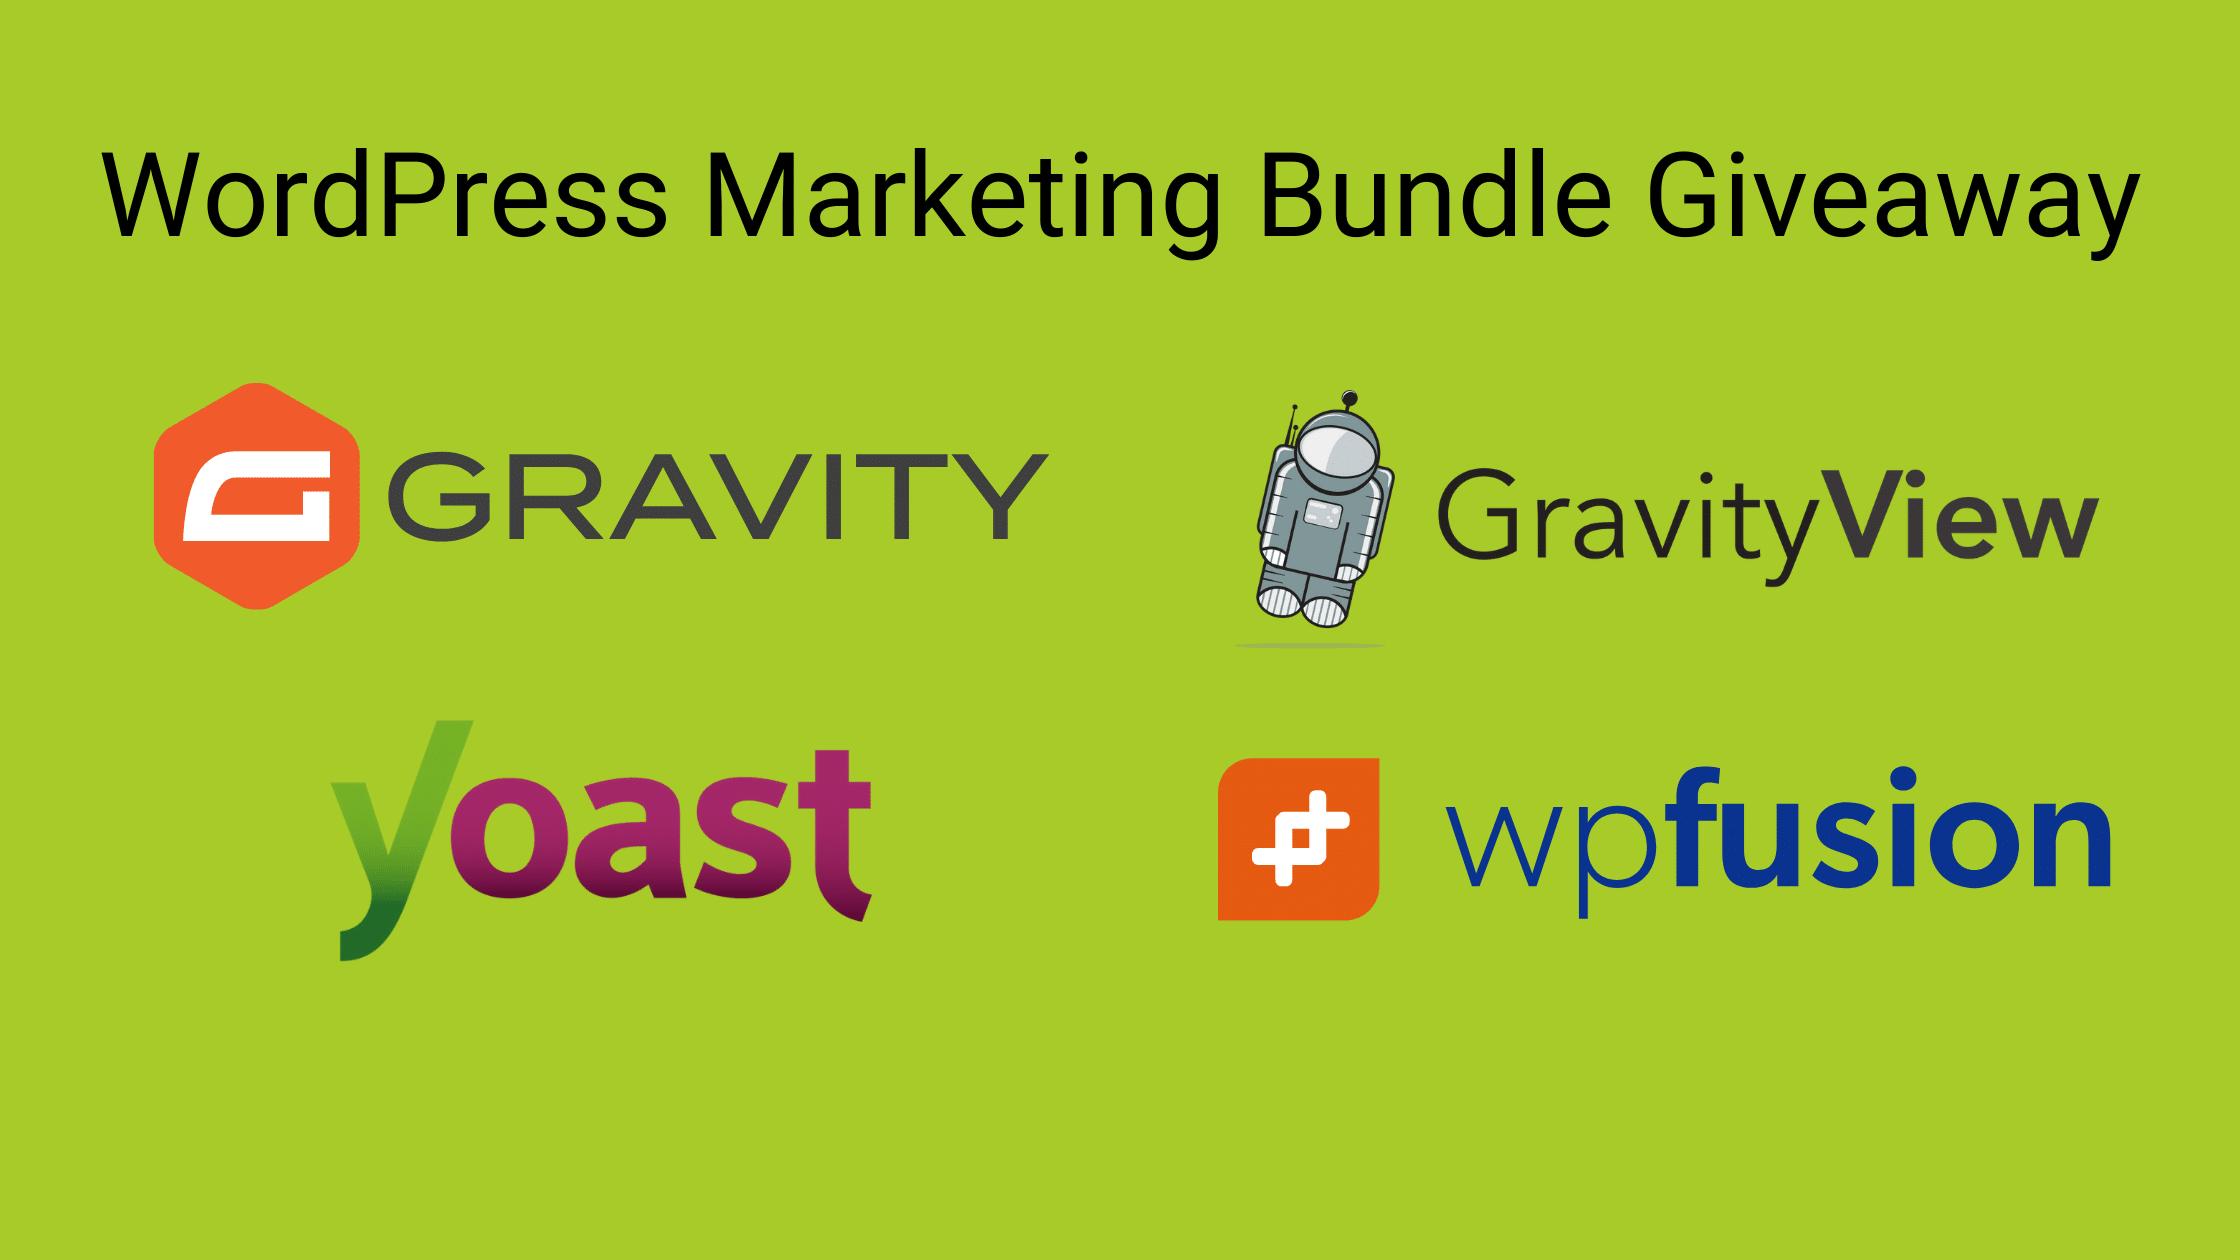 WordPress Marketing Bundle Giveaway